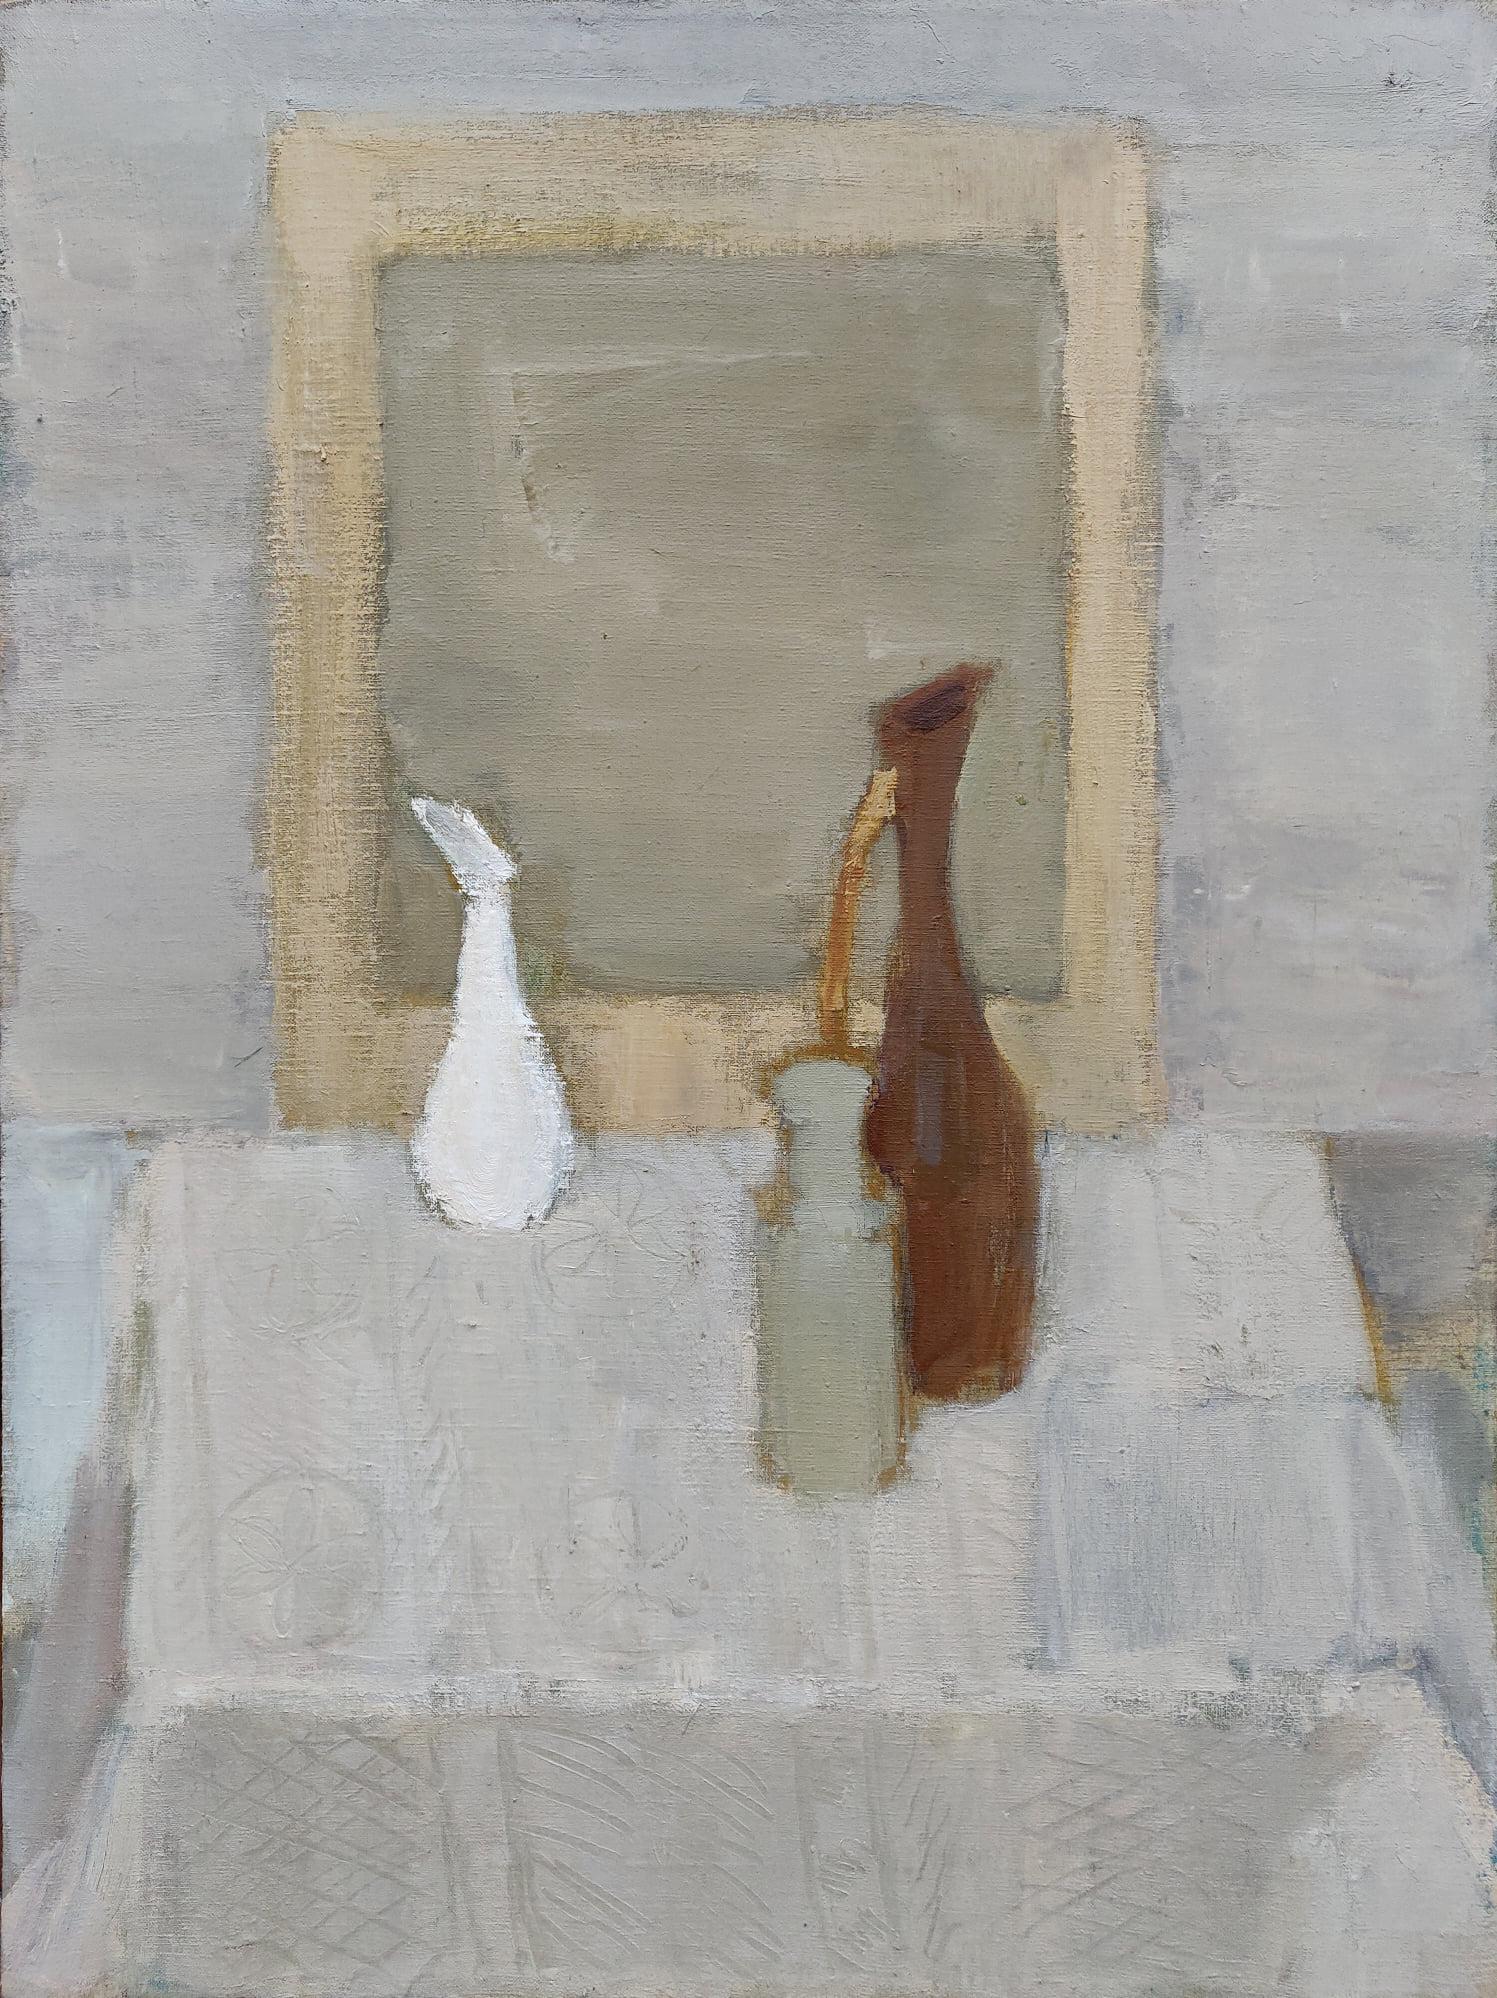 Still Life №6 - 21st Century Contemporary Minimalist Oil Painting